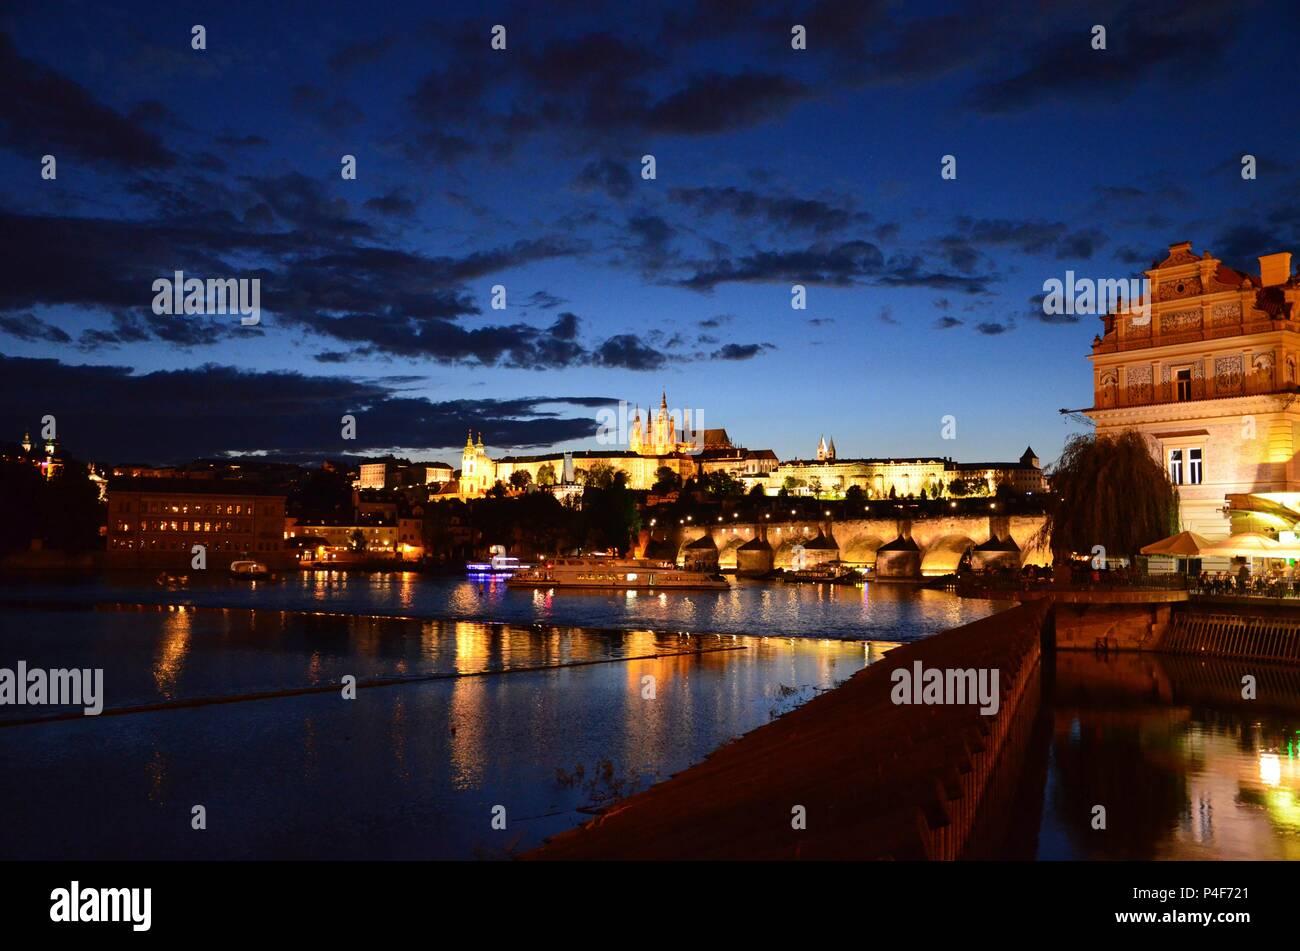 Illuminated Prague city along the river Moldau at night with view towards Charles Bridge and Castle - Stock Image